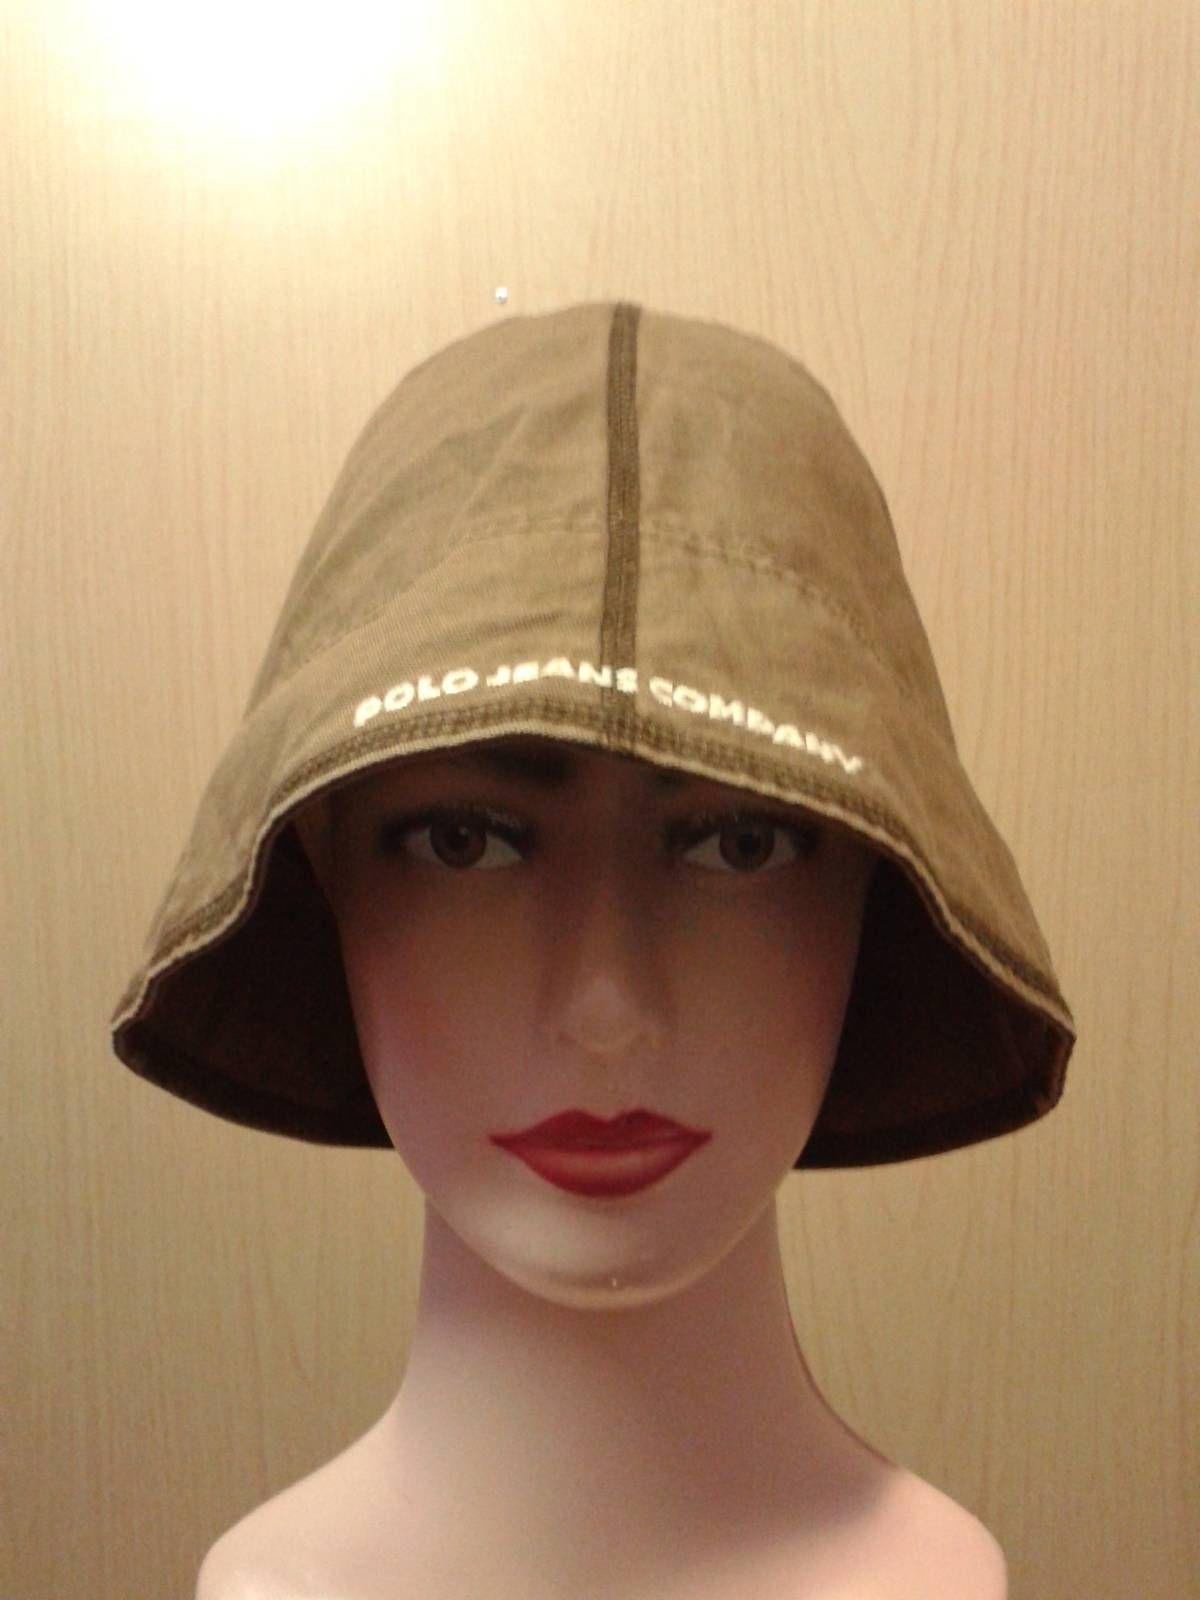 8acad0e5d82 Searching for Vintage 90s Polo jeans ralph lauren brown bucket hat cap   We ve